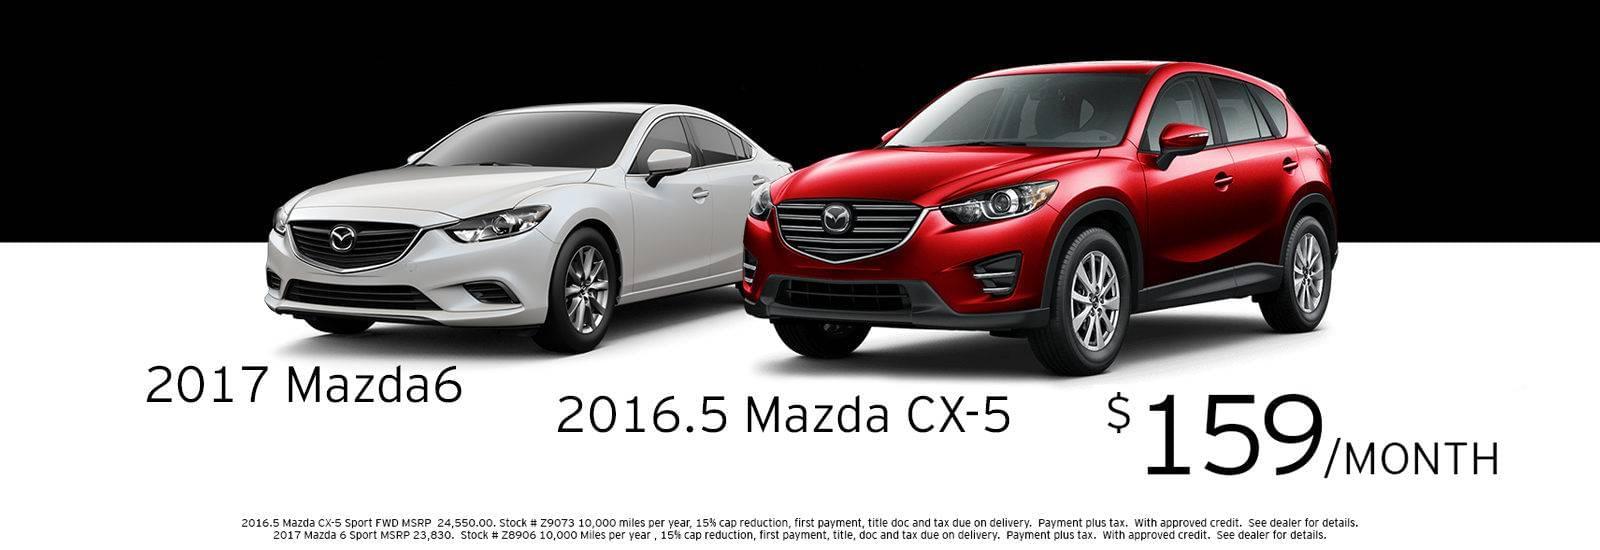 Mazda6_CX-5_Combo_159-slider-1600x550